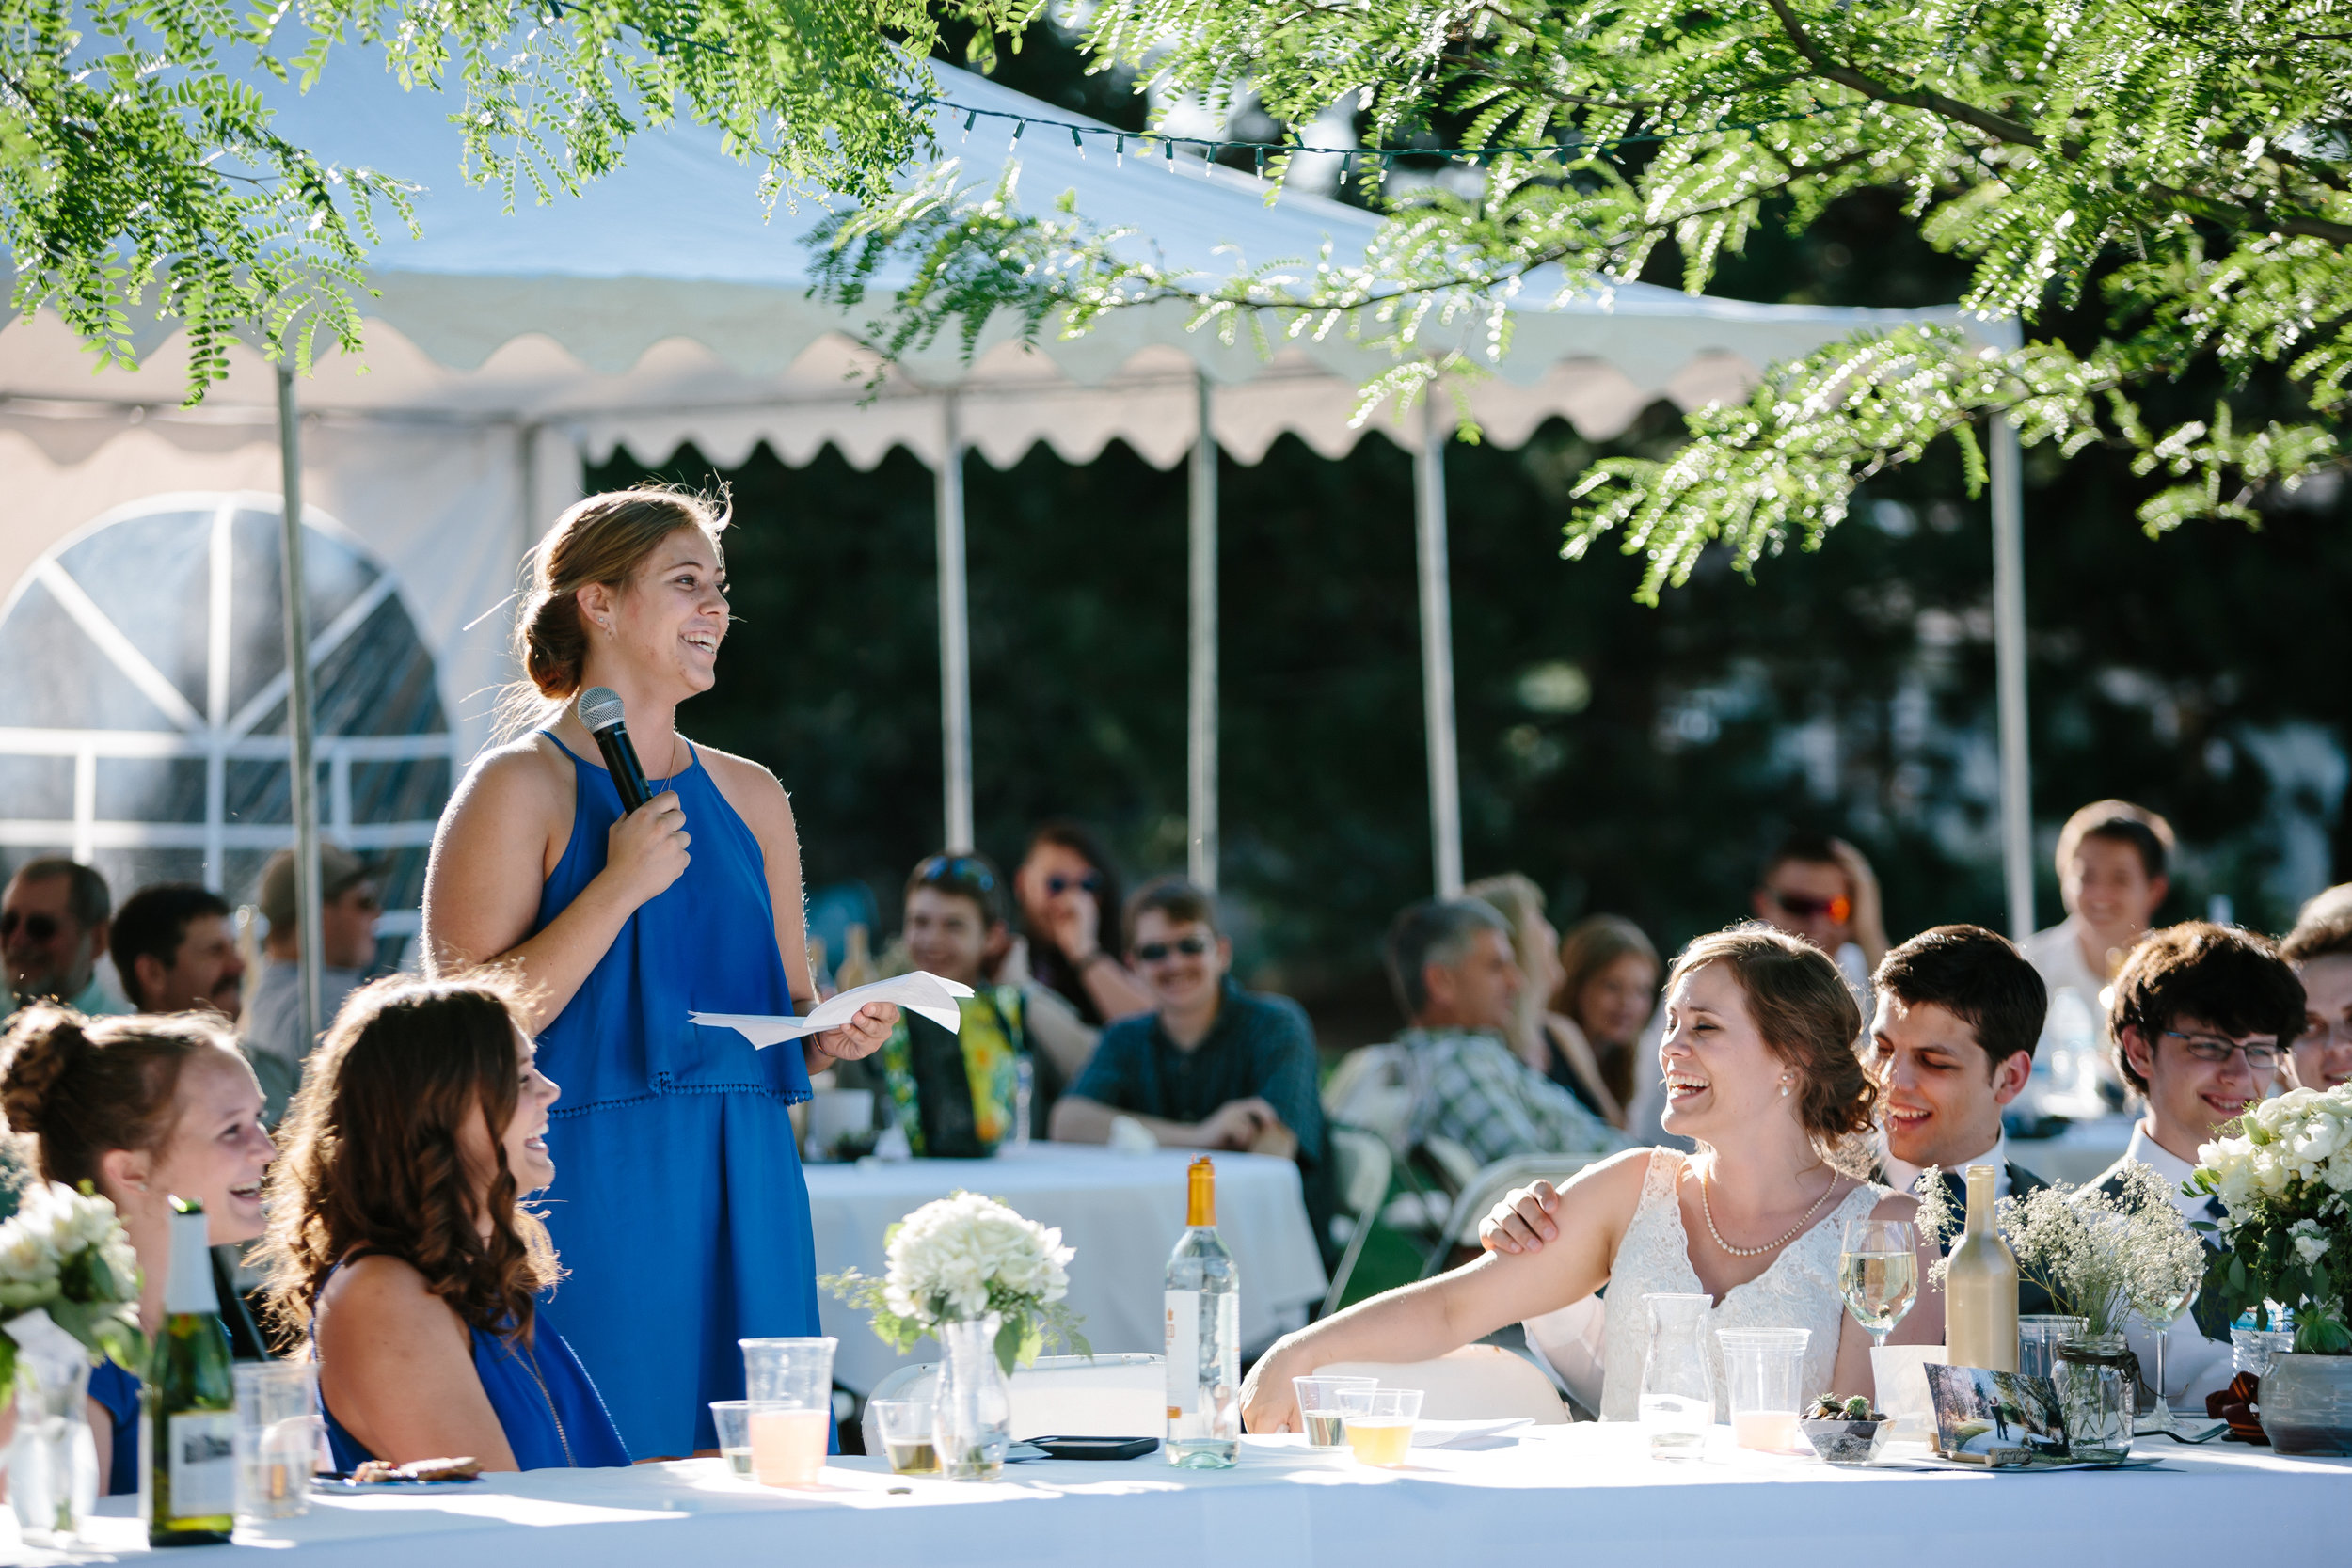 Jordan & Shantel Married - Idaho - Corrie Mick Photography-275.jpg